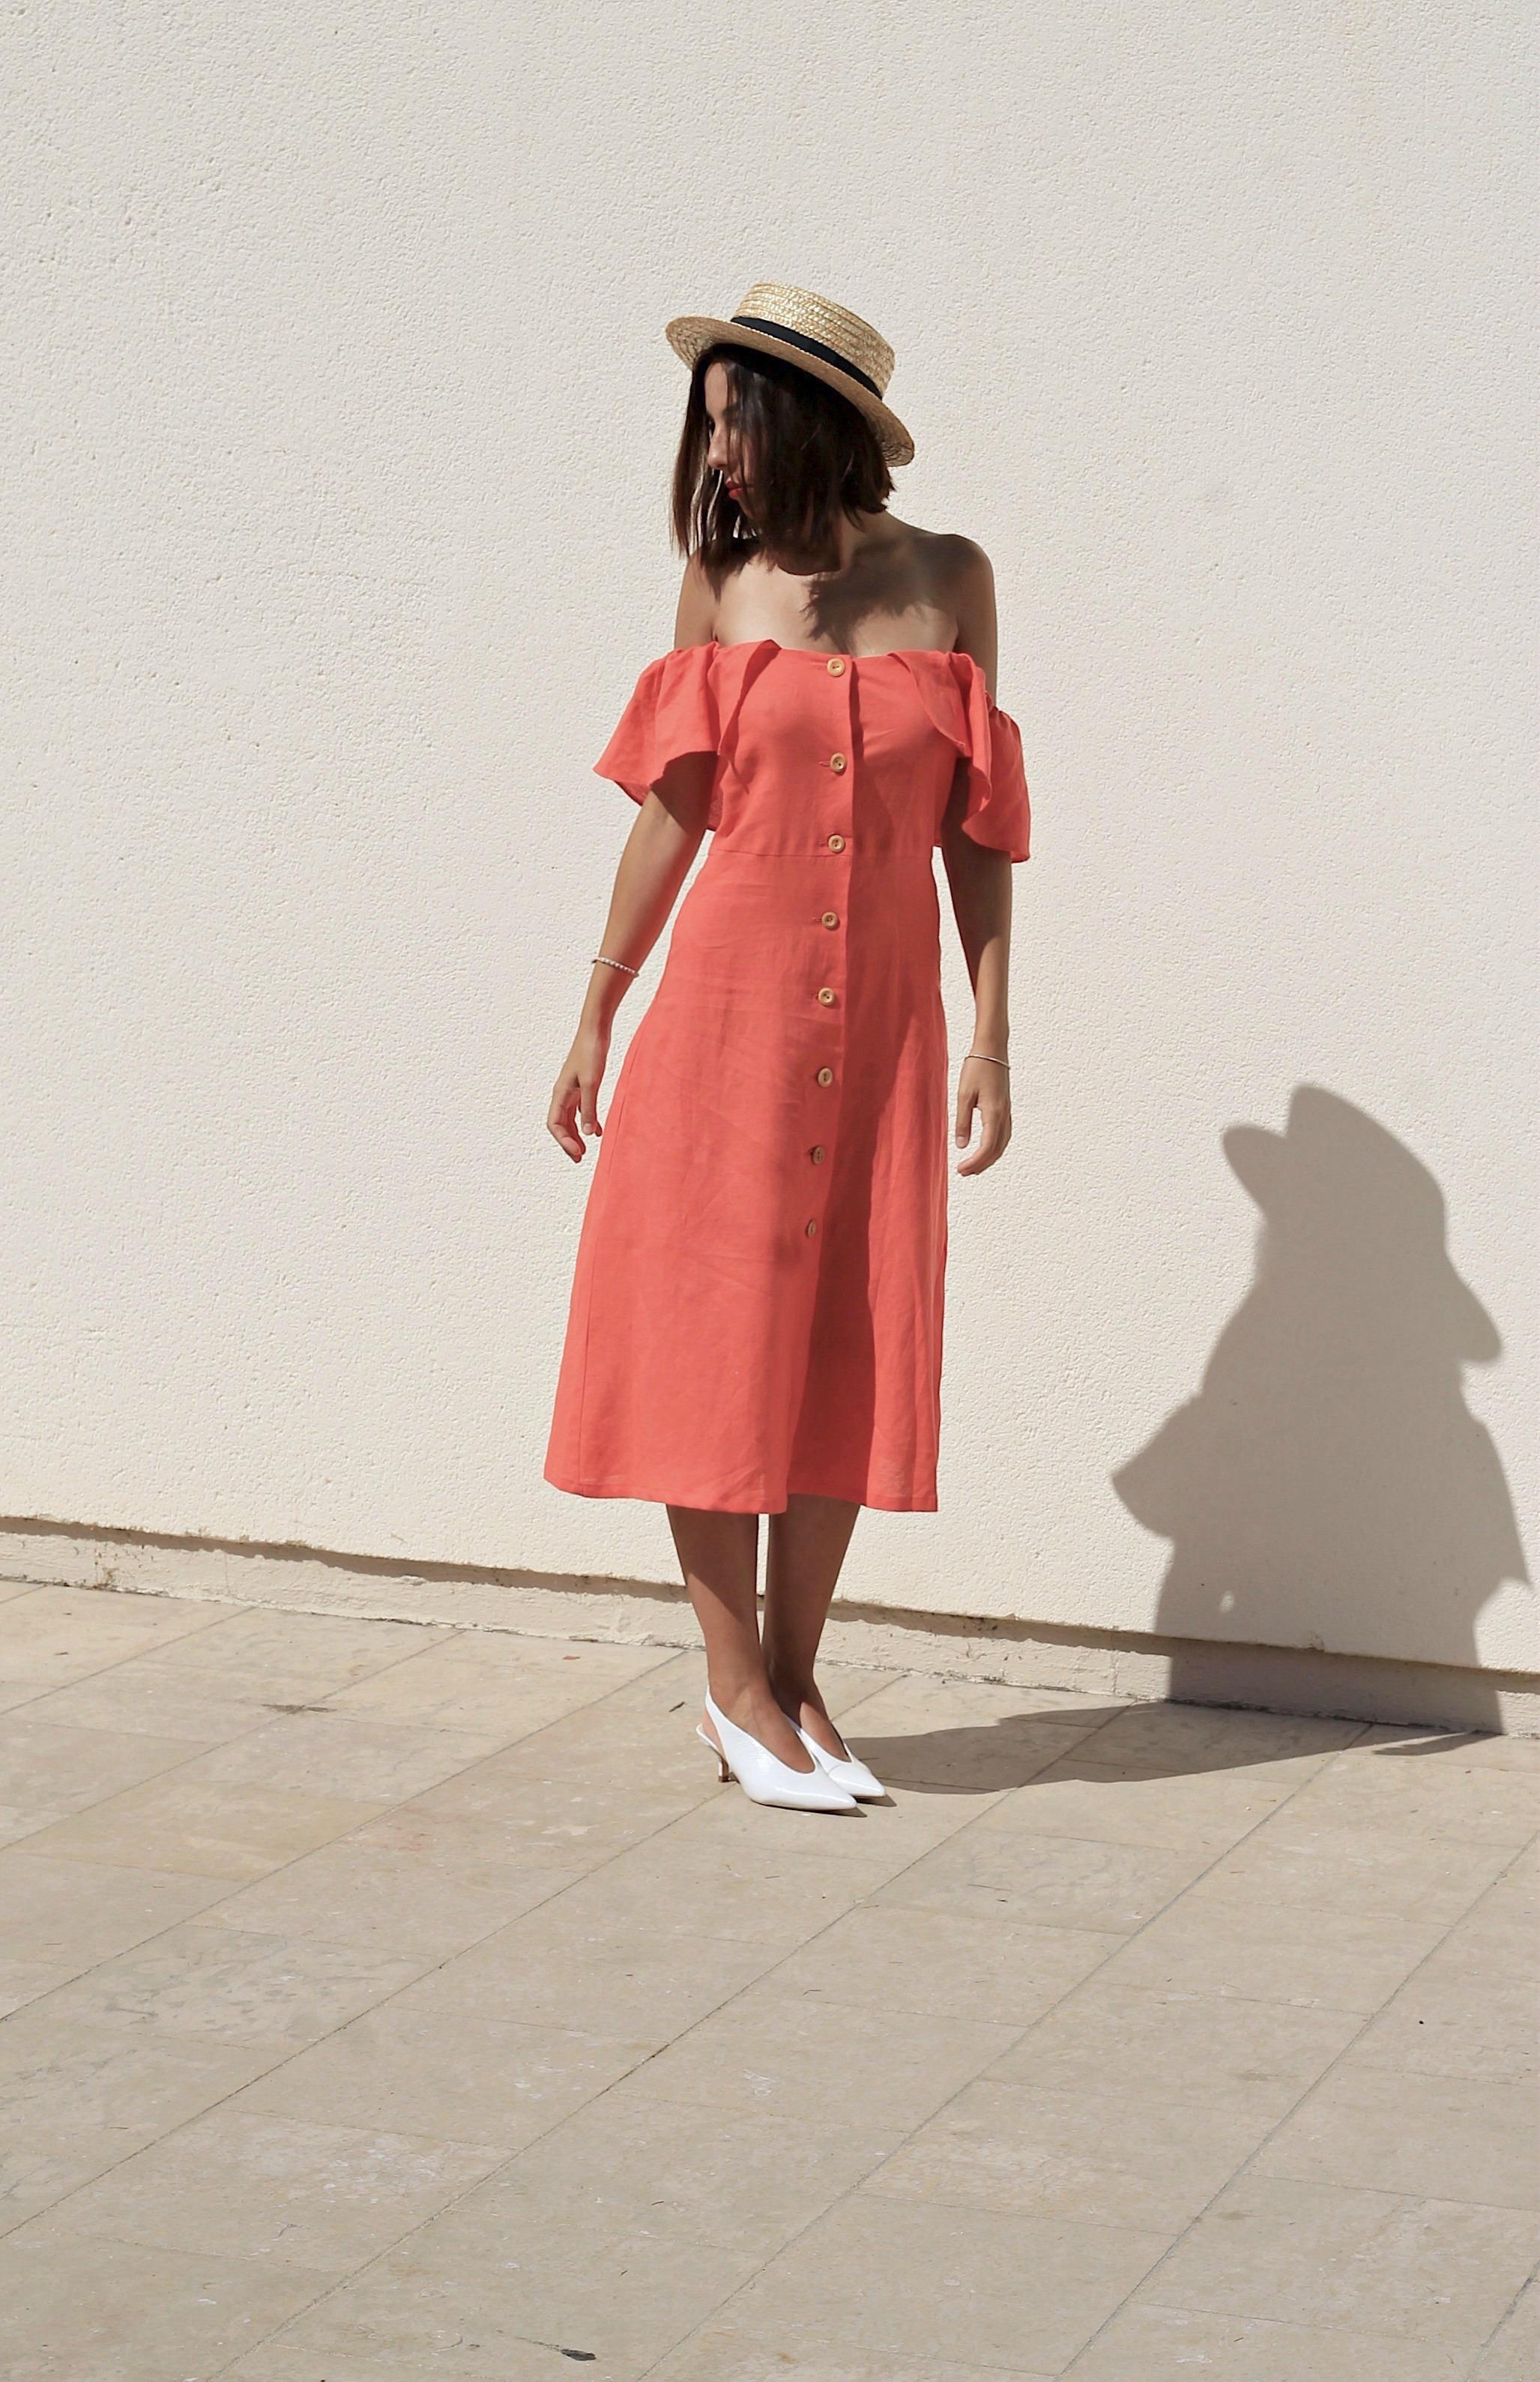 Haute couture 2017, theladycracy.it, elisa bellino, haute couture fall winter 2017, outfit estate 2017, outfit blogger estate 2017, fashion blog 2017, fashion blogger italiane 2017, fashion blogger famose 2017, fashion blogger milano 2017, blogger moda più seguite 2017